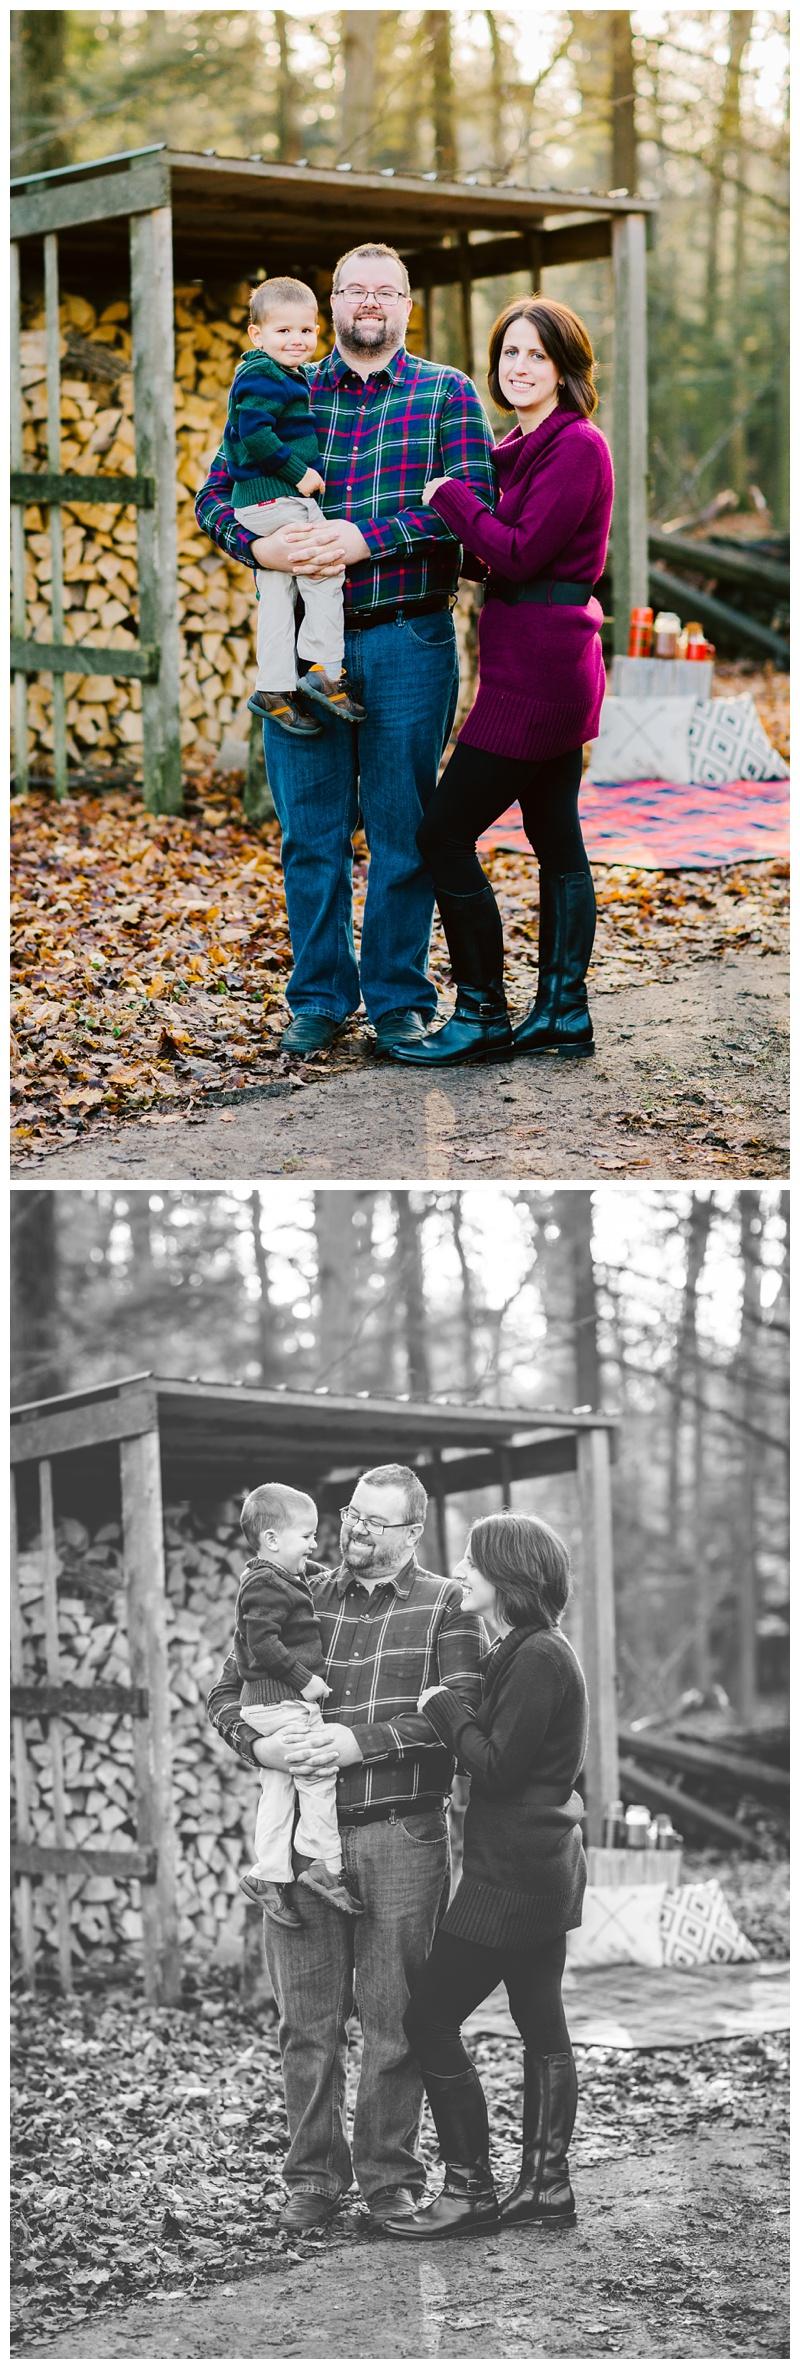 Peninsula State Park Milwaukee Wedding Photographers | www.karenann.photography